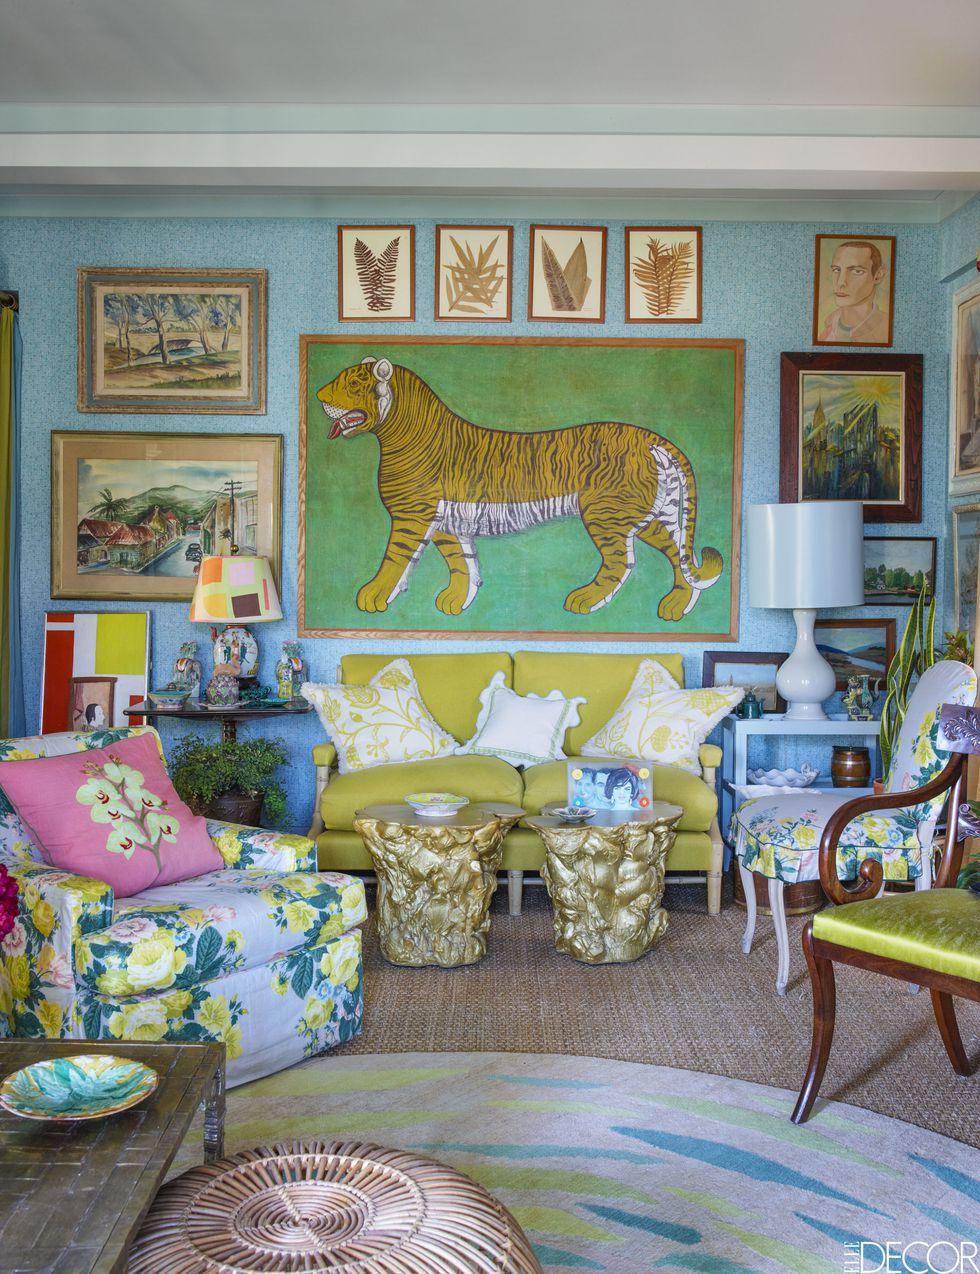 wall-decor-ideas-gallery-1471471052-manhattan-home-1518106445